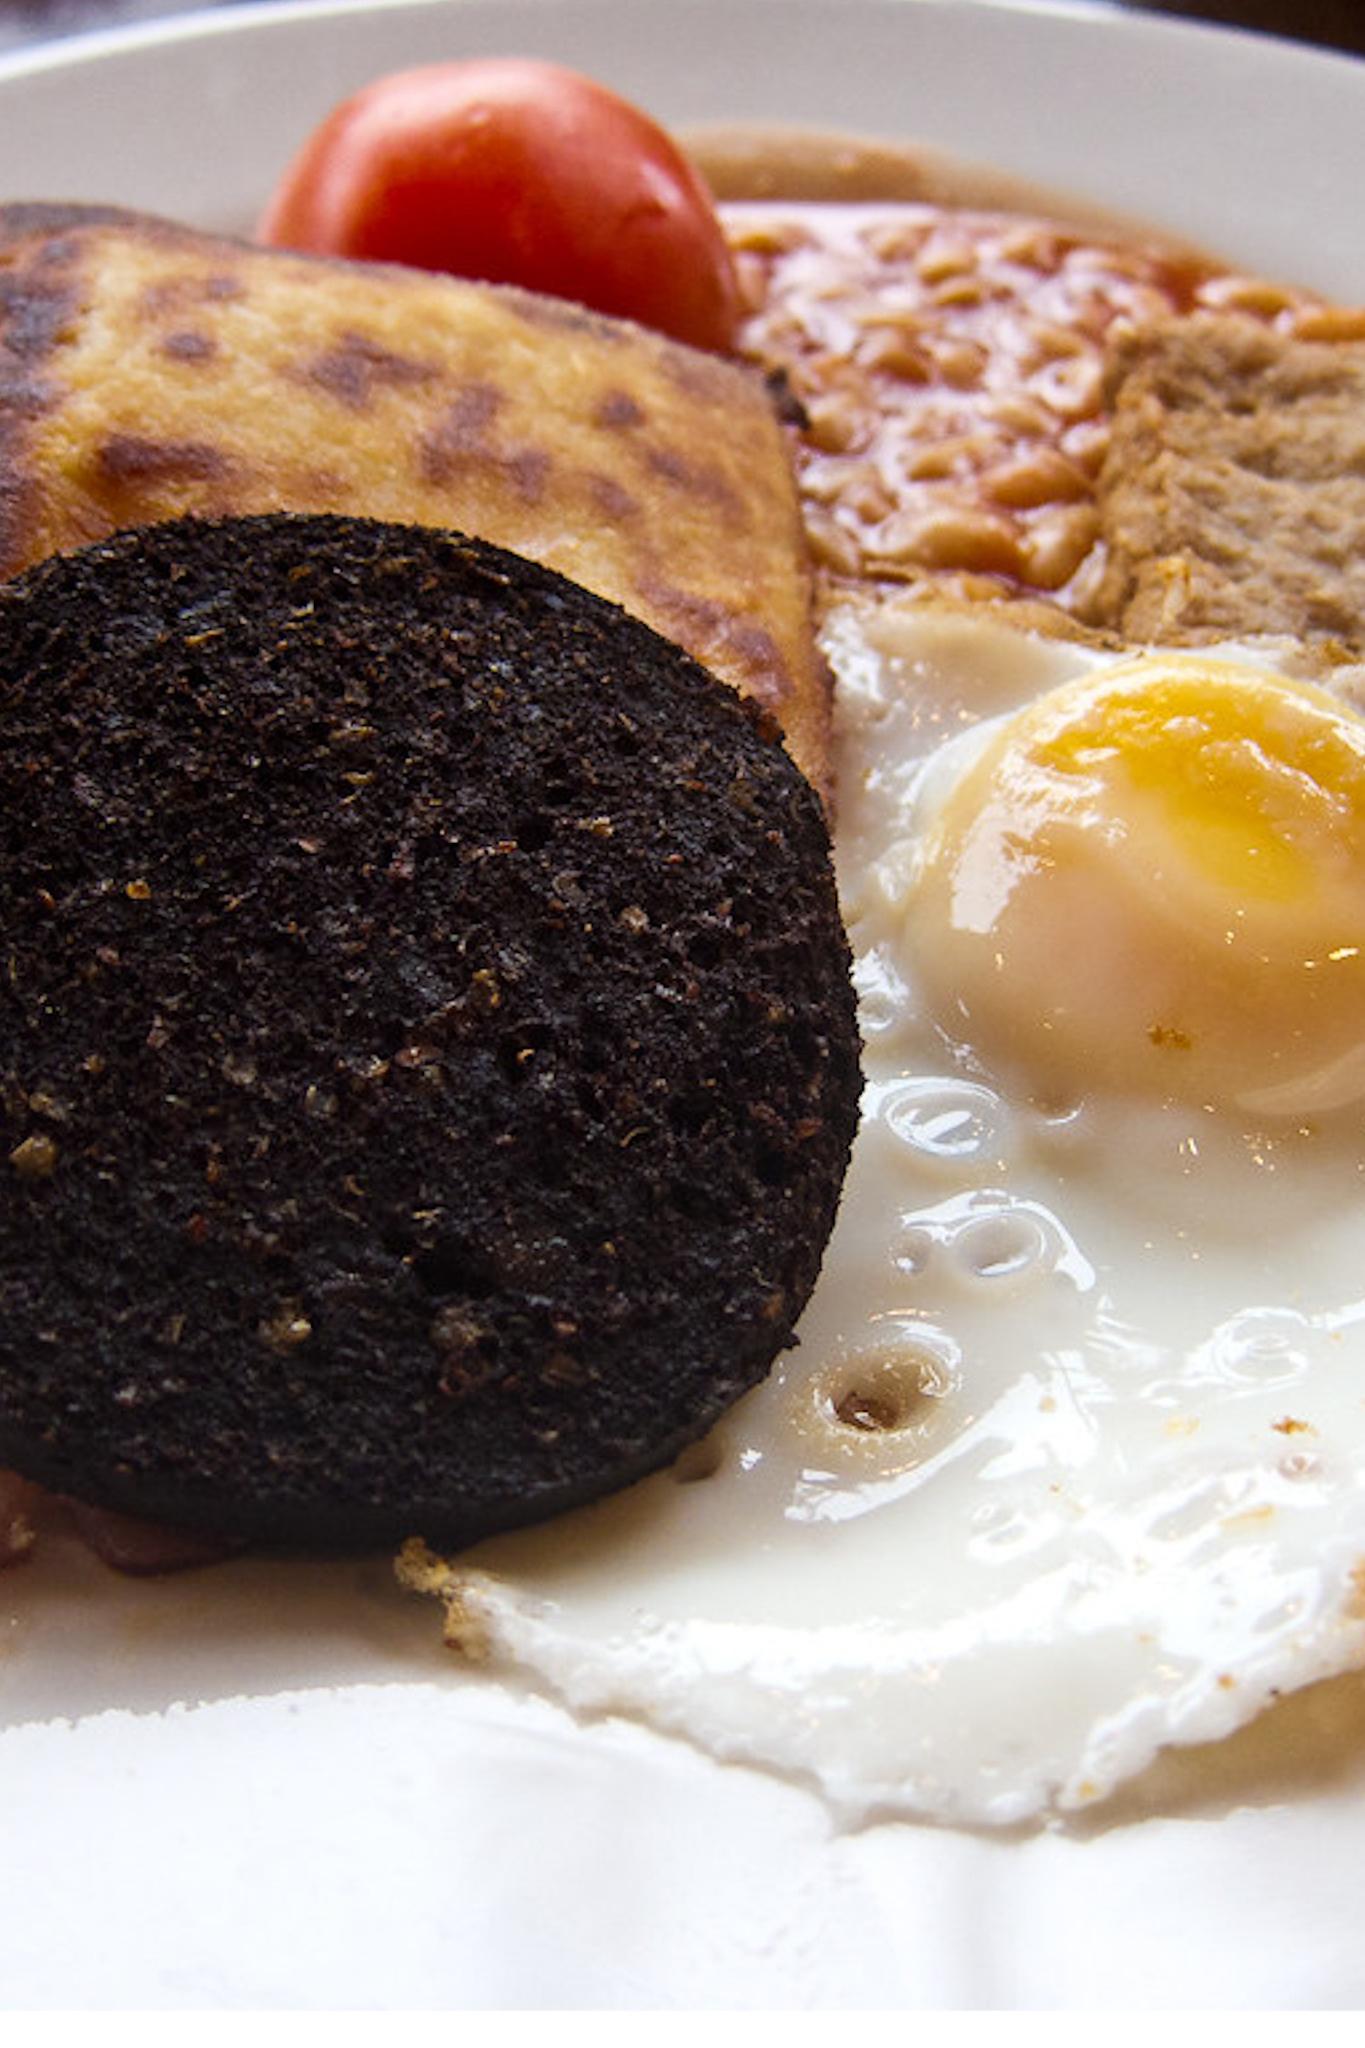 Black pudding in a full Scottish breakfast